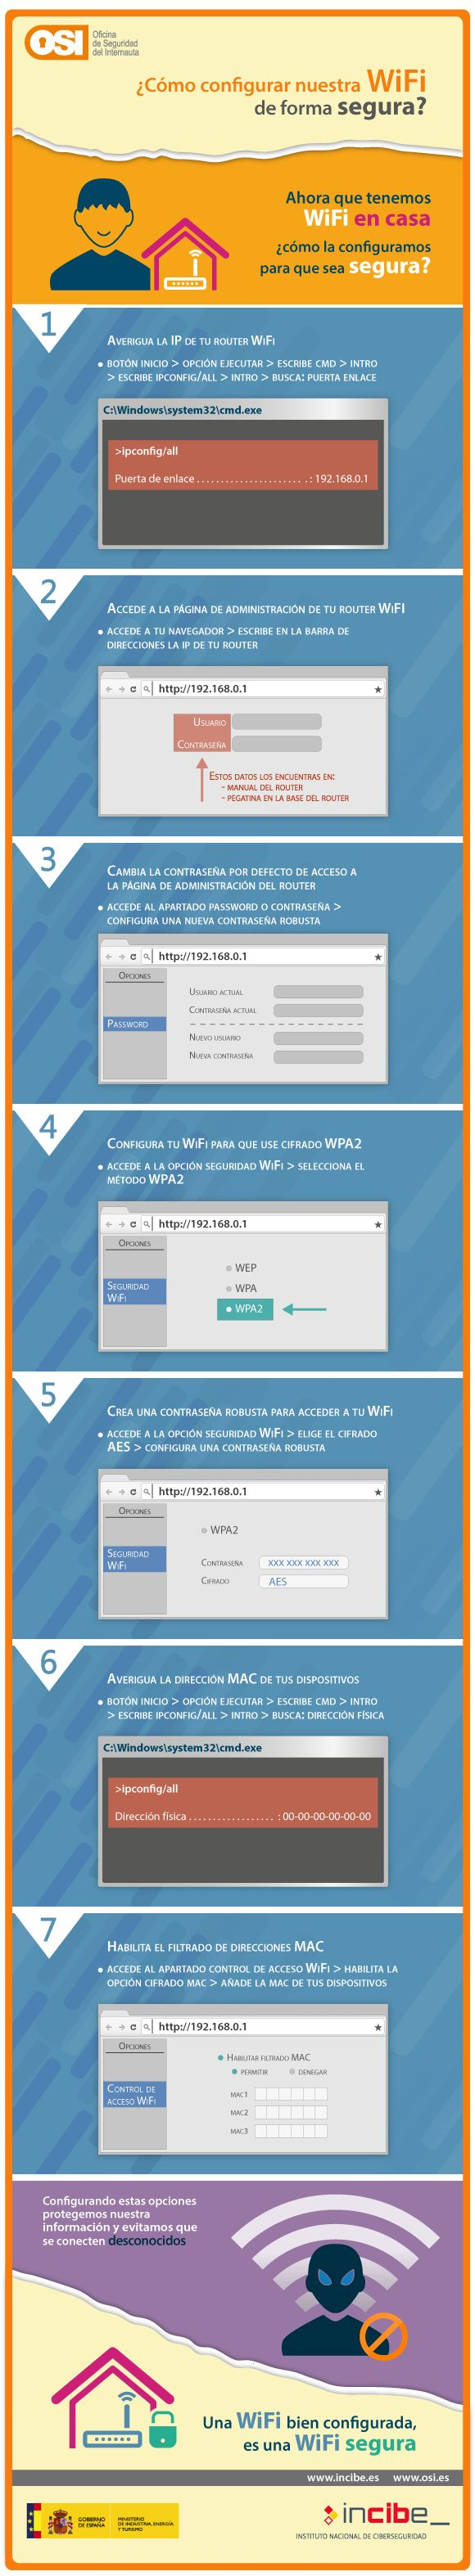 7 pasos para asegurar tu wifi #seguridad #wifi